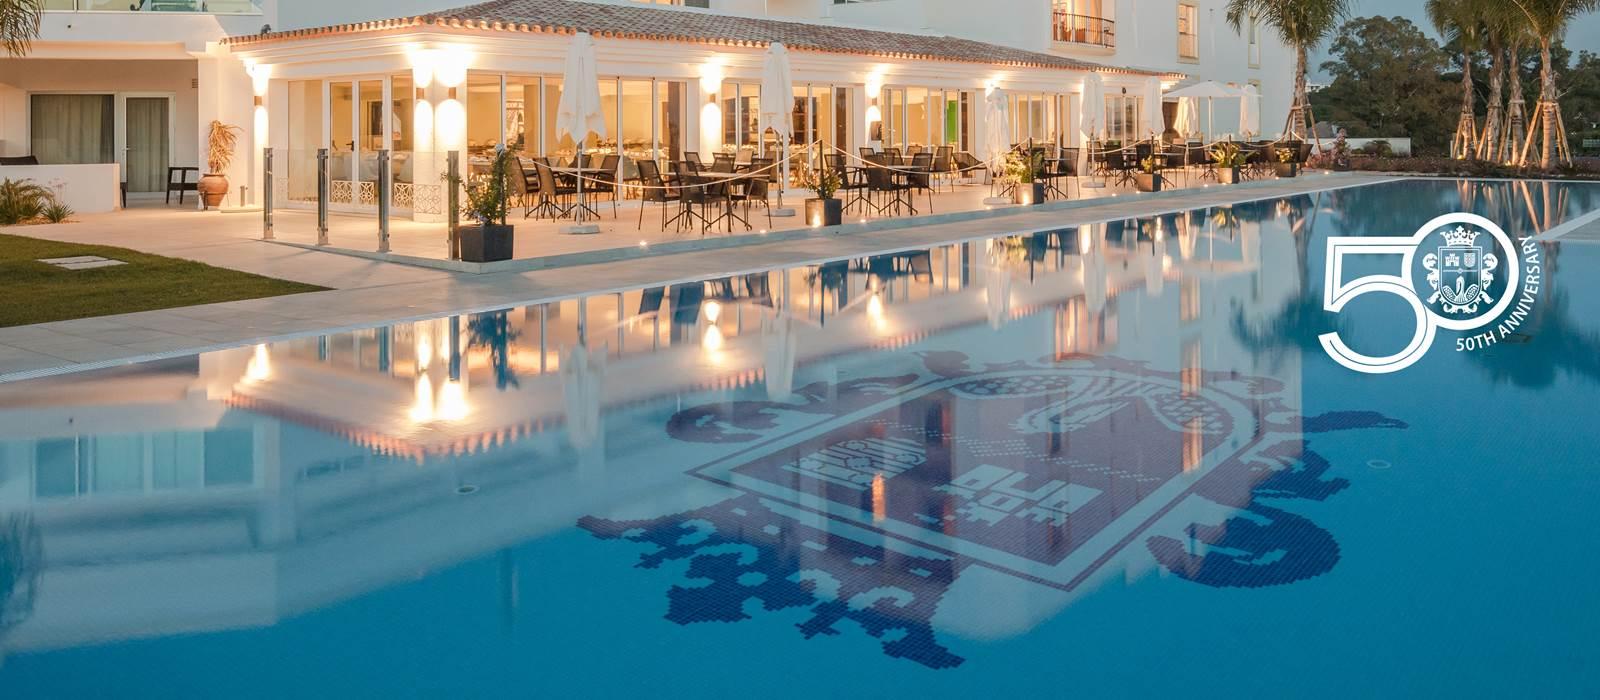 Dona Filipa Hotel Luxury 5 Star Algarve Hotel